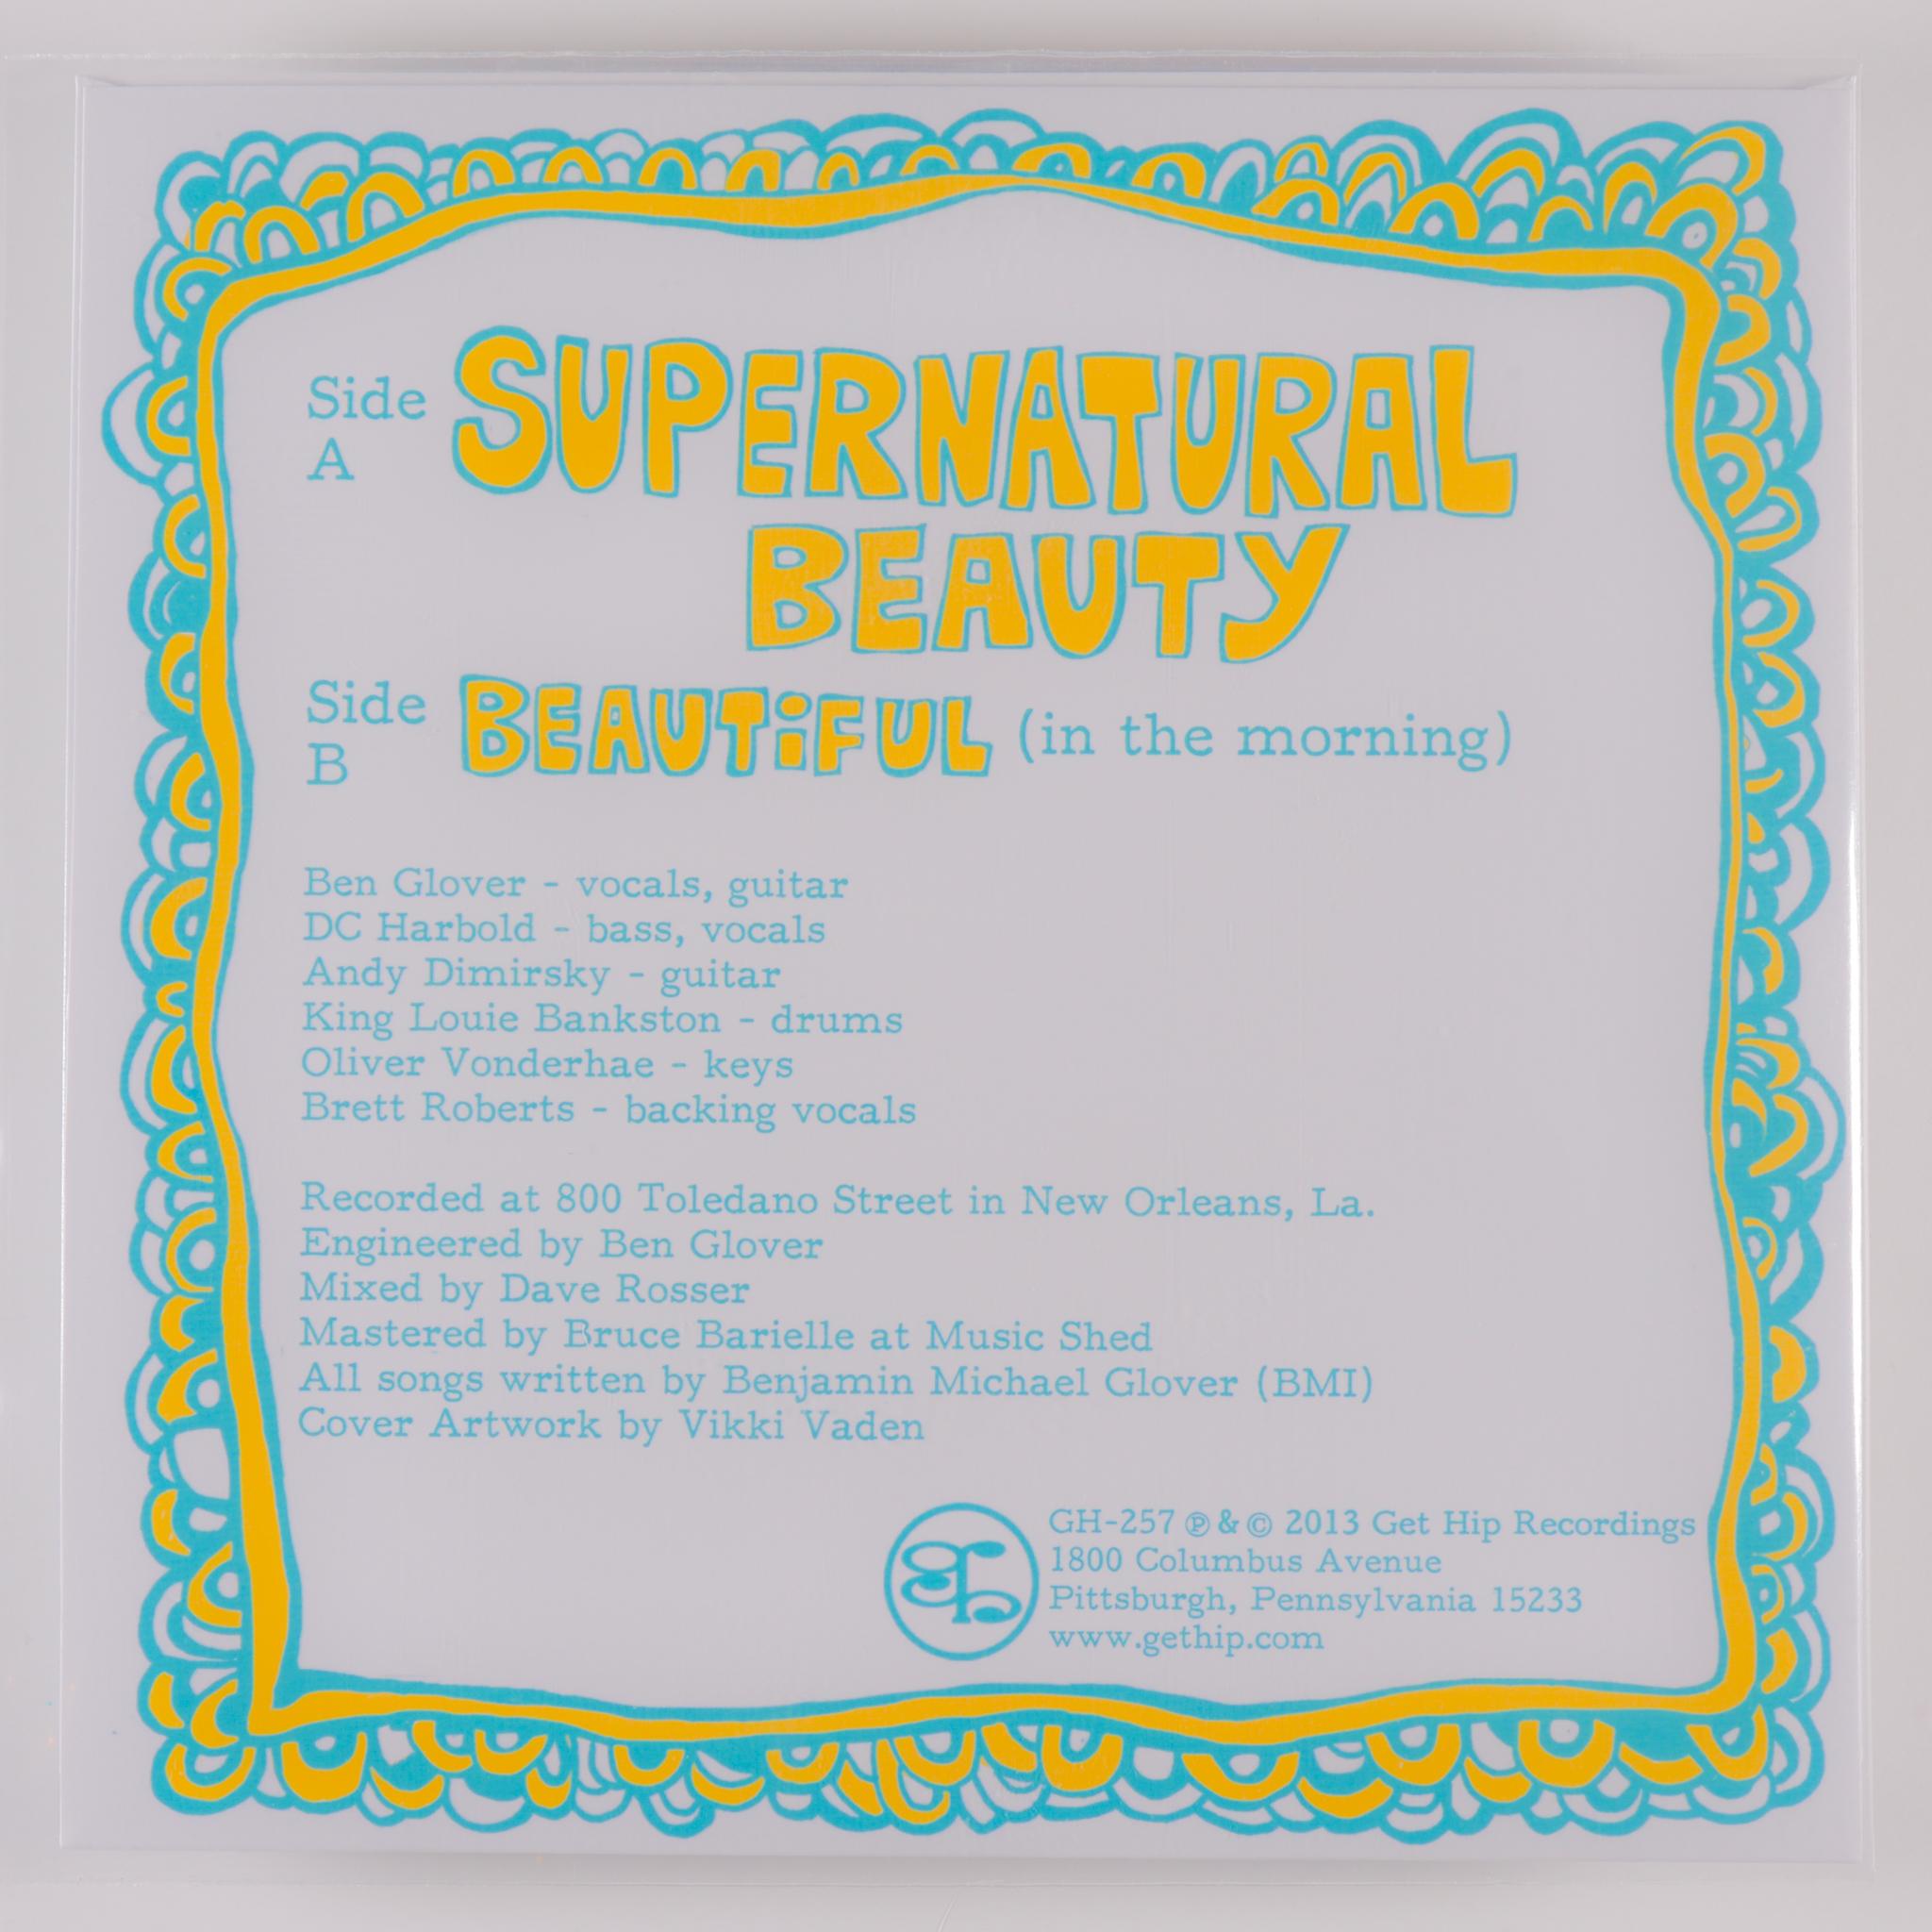 Bipolaroid - Supernatural Beauty